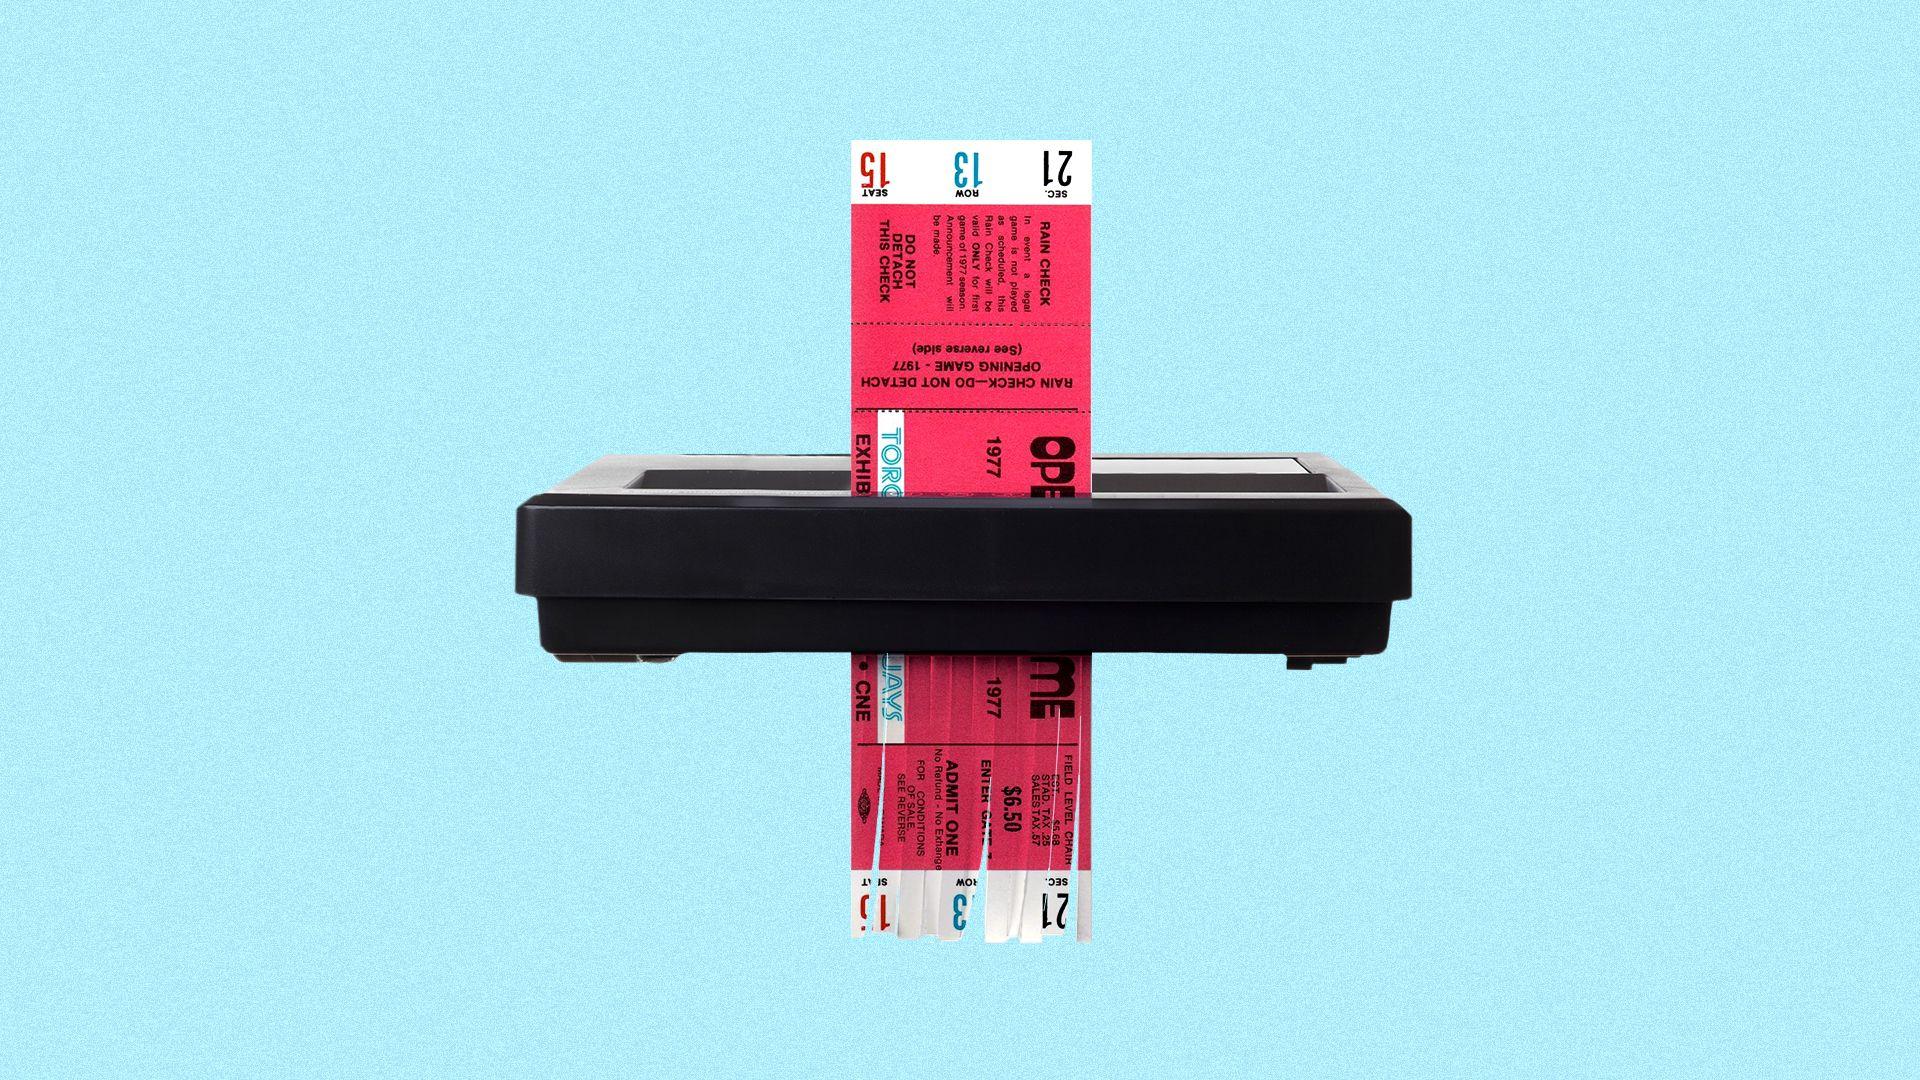 Illustration of an old paper Toronto Blue Jays ticket being shredded